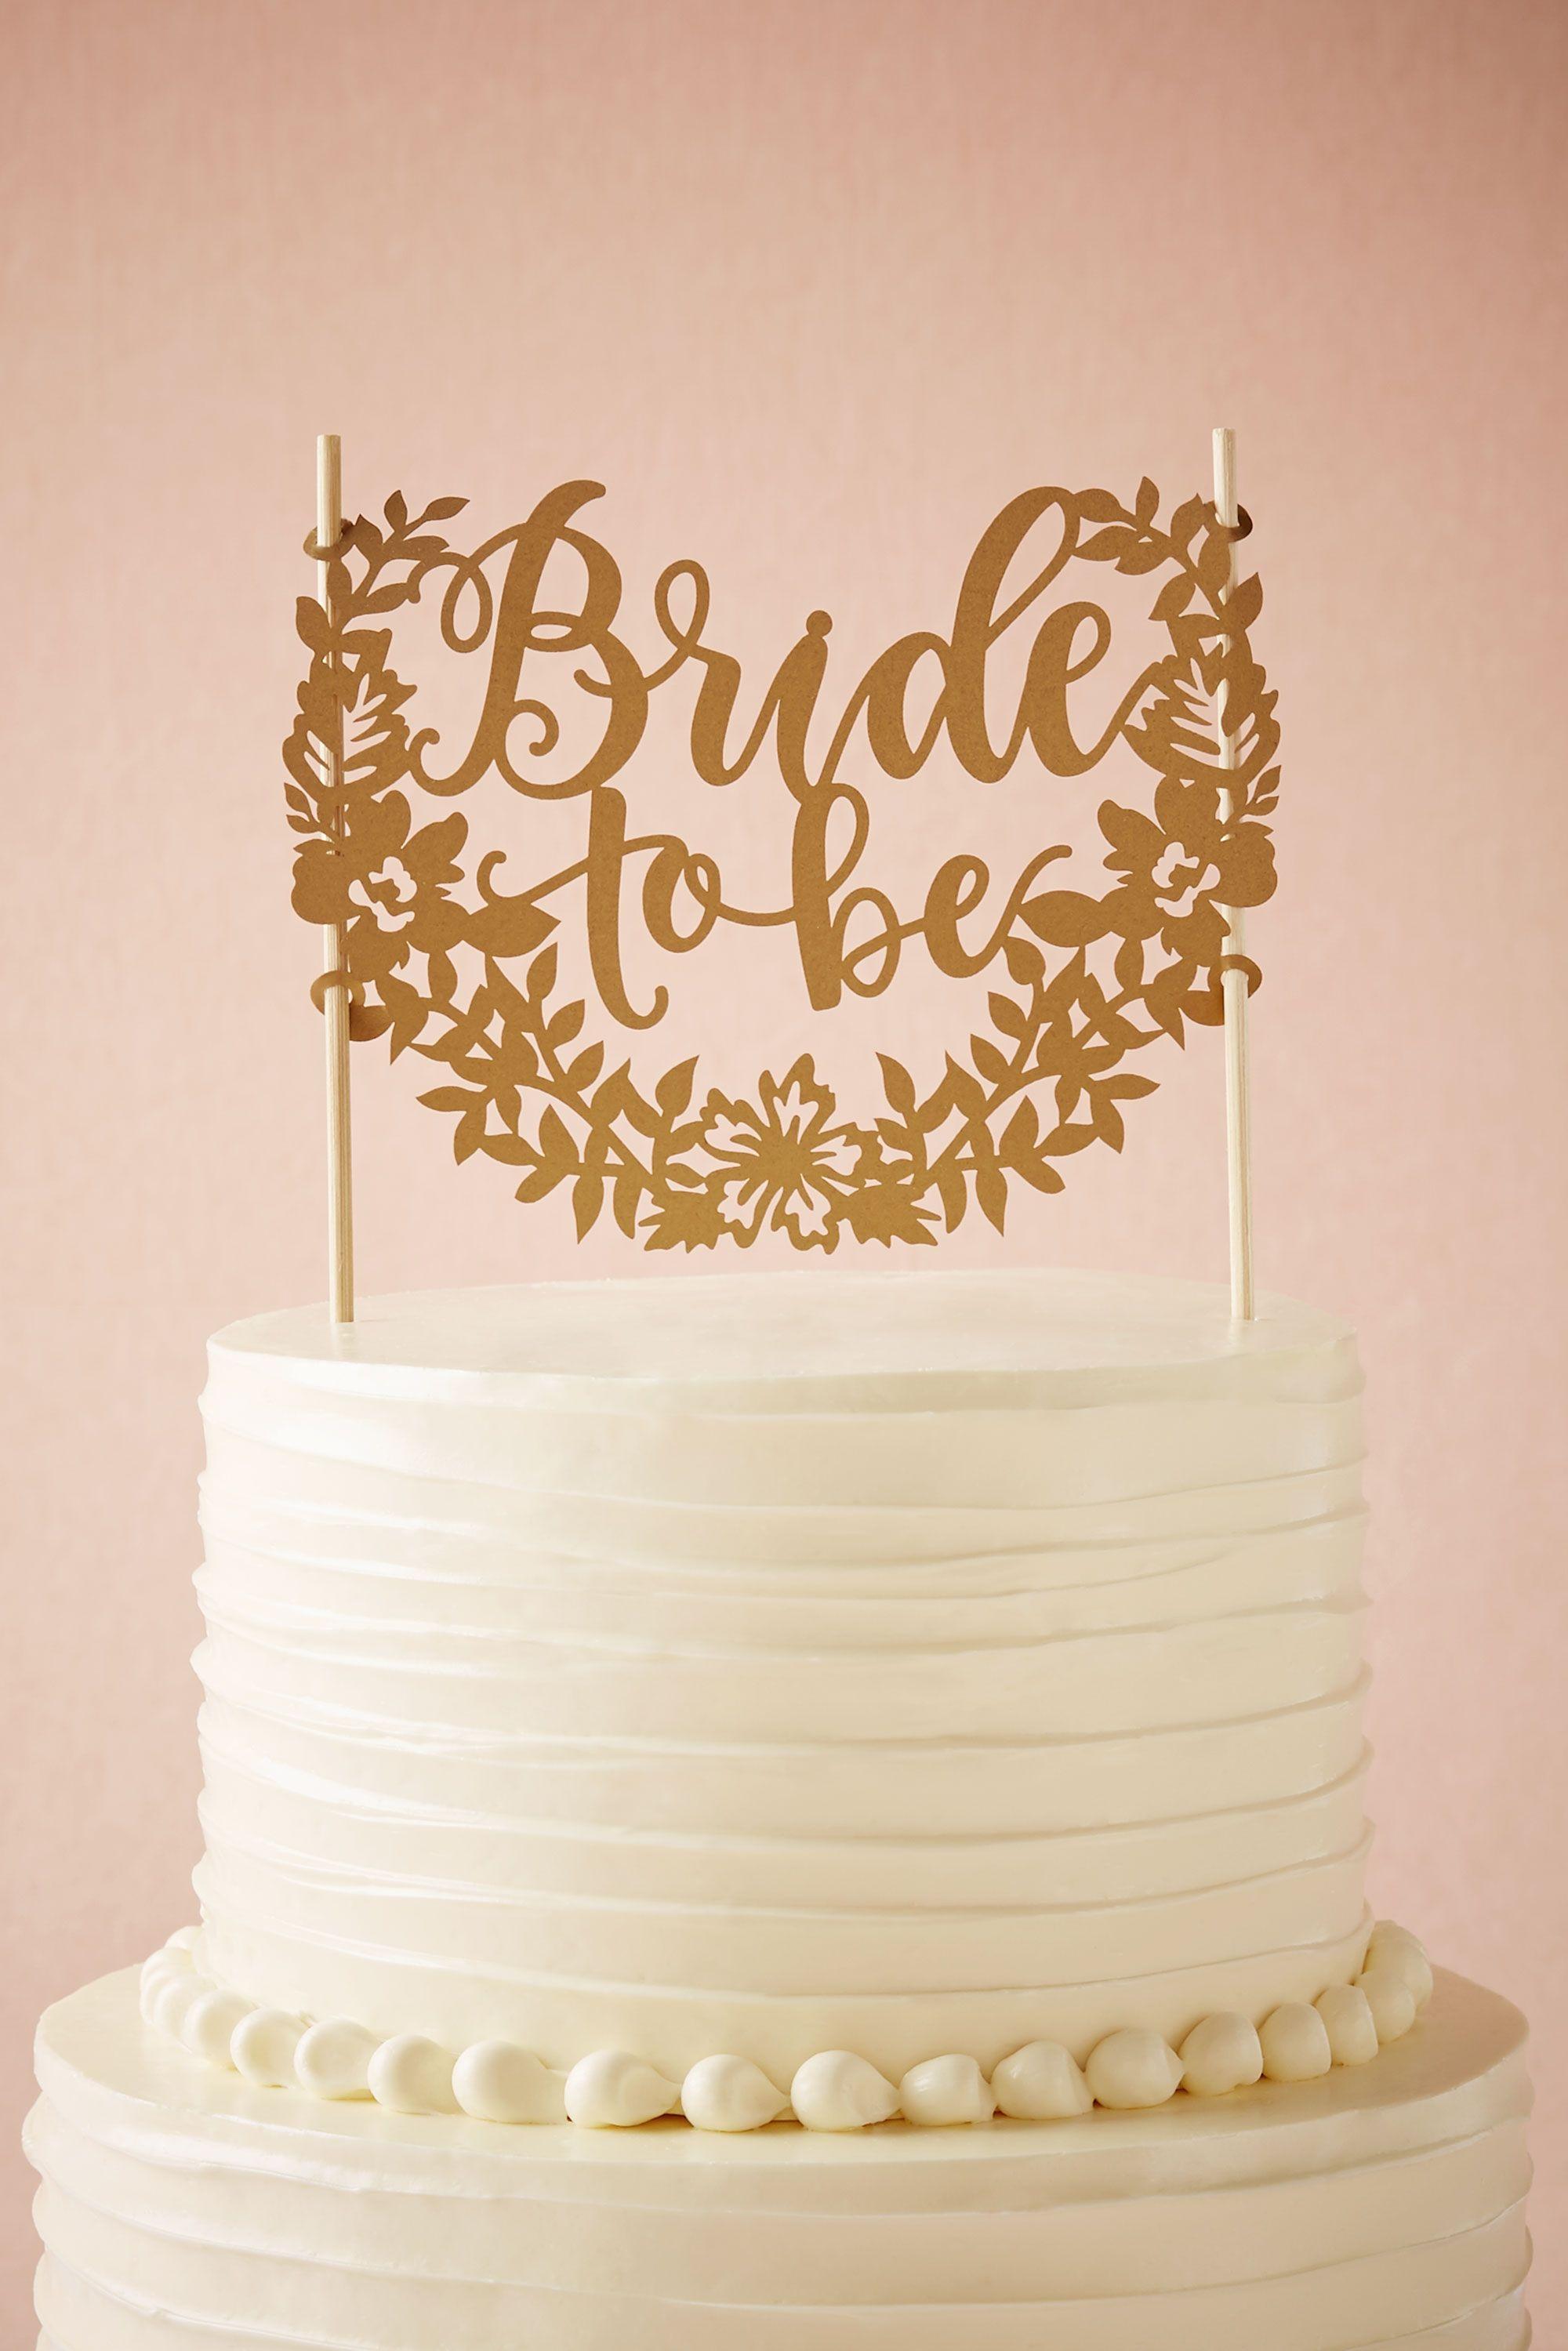 Bride to Be Cake Topper in Dcor BHLDN